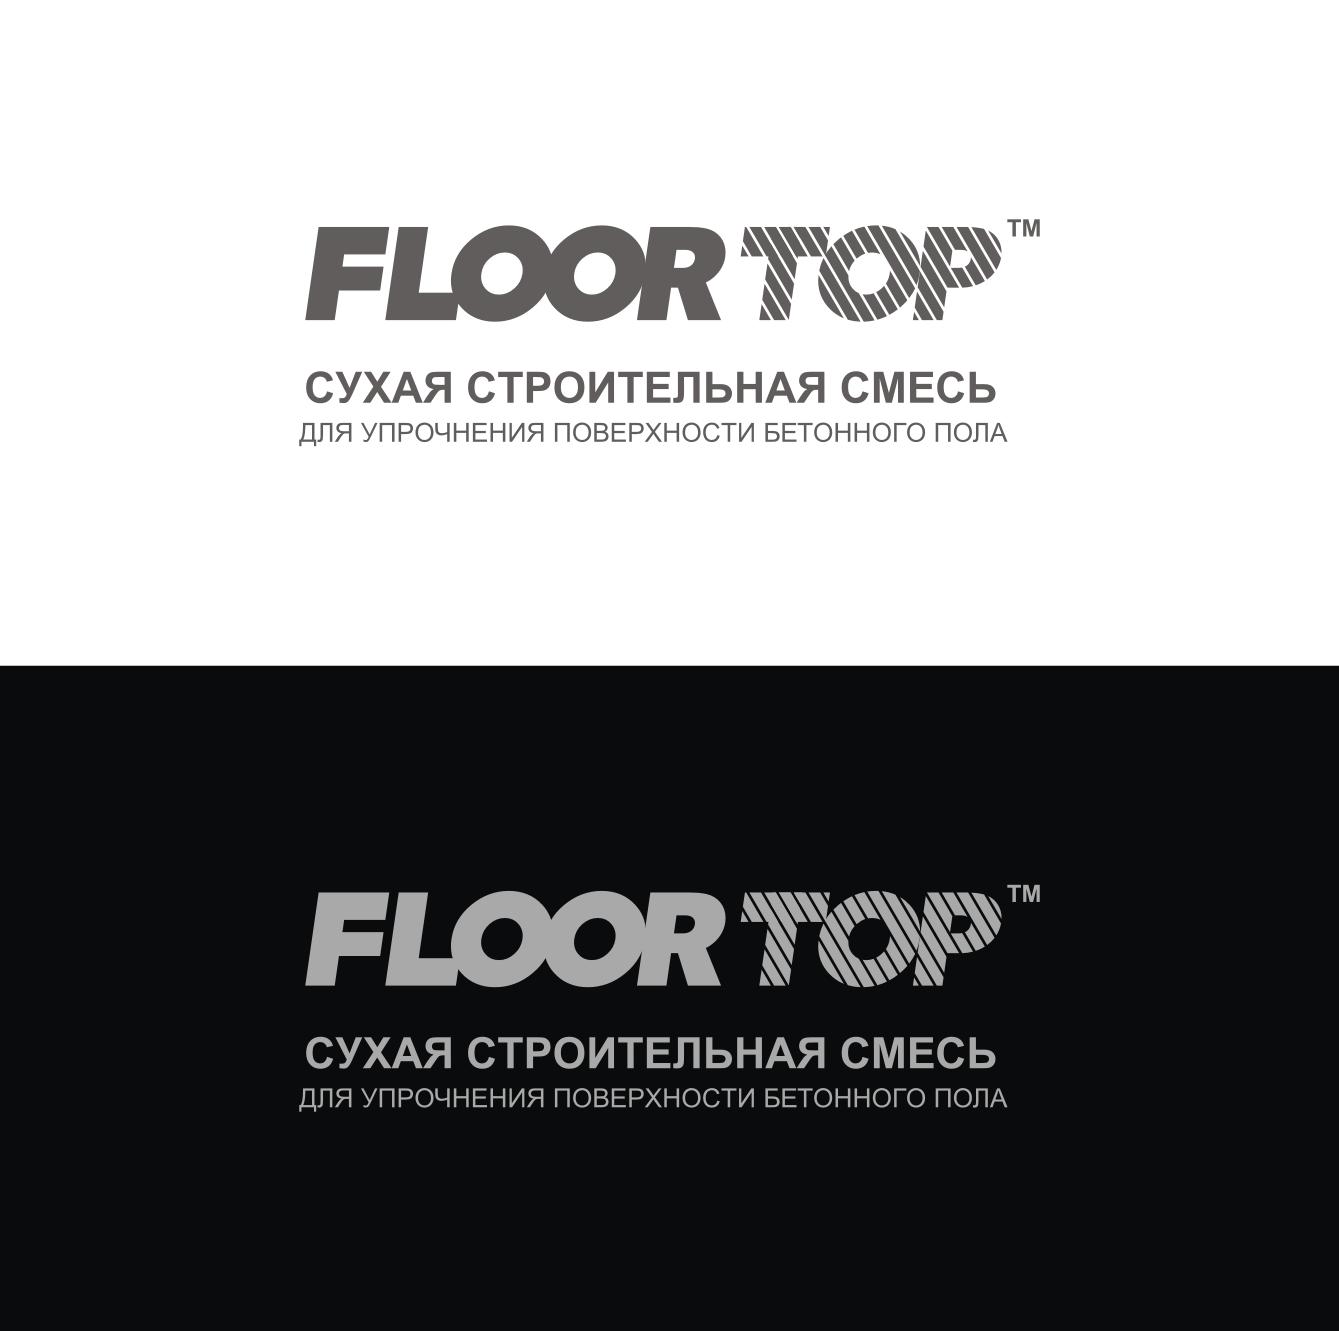 Разработка логотипа и дизайна на упаковку для сухой смеси фото f_8365d274b1e44ab2.png